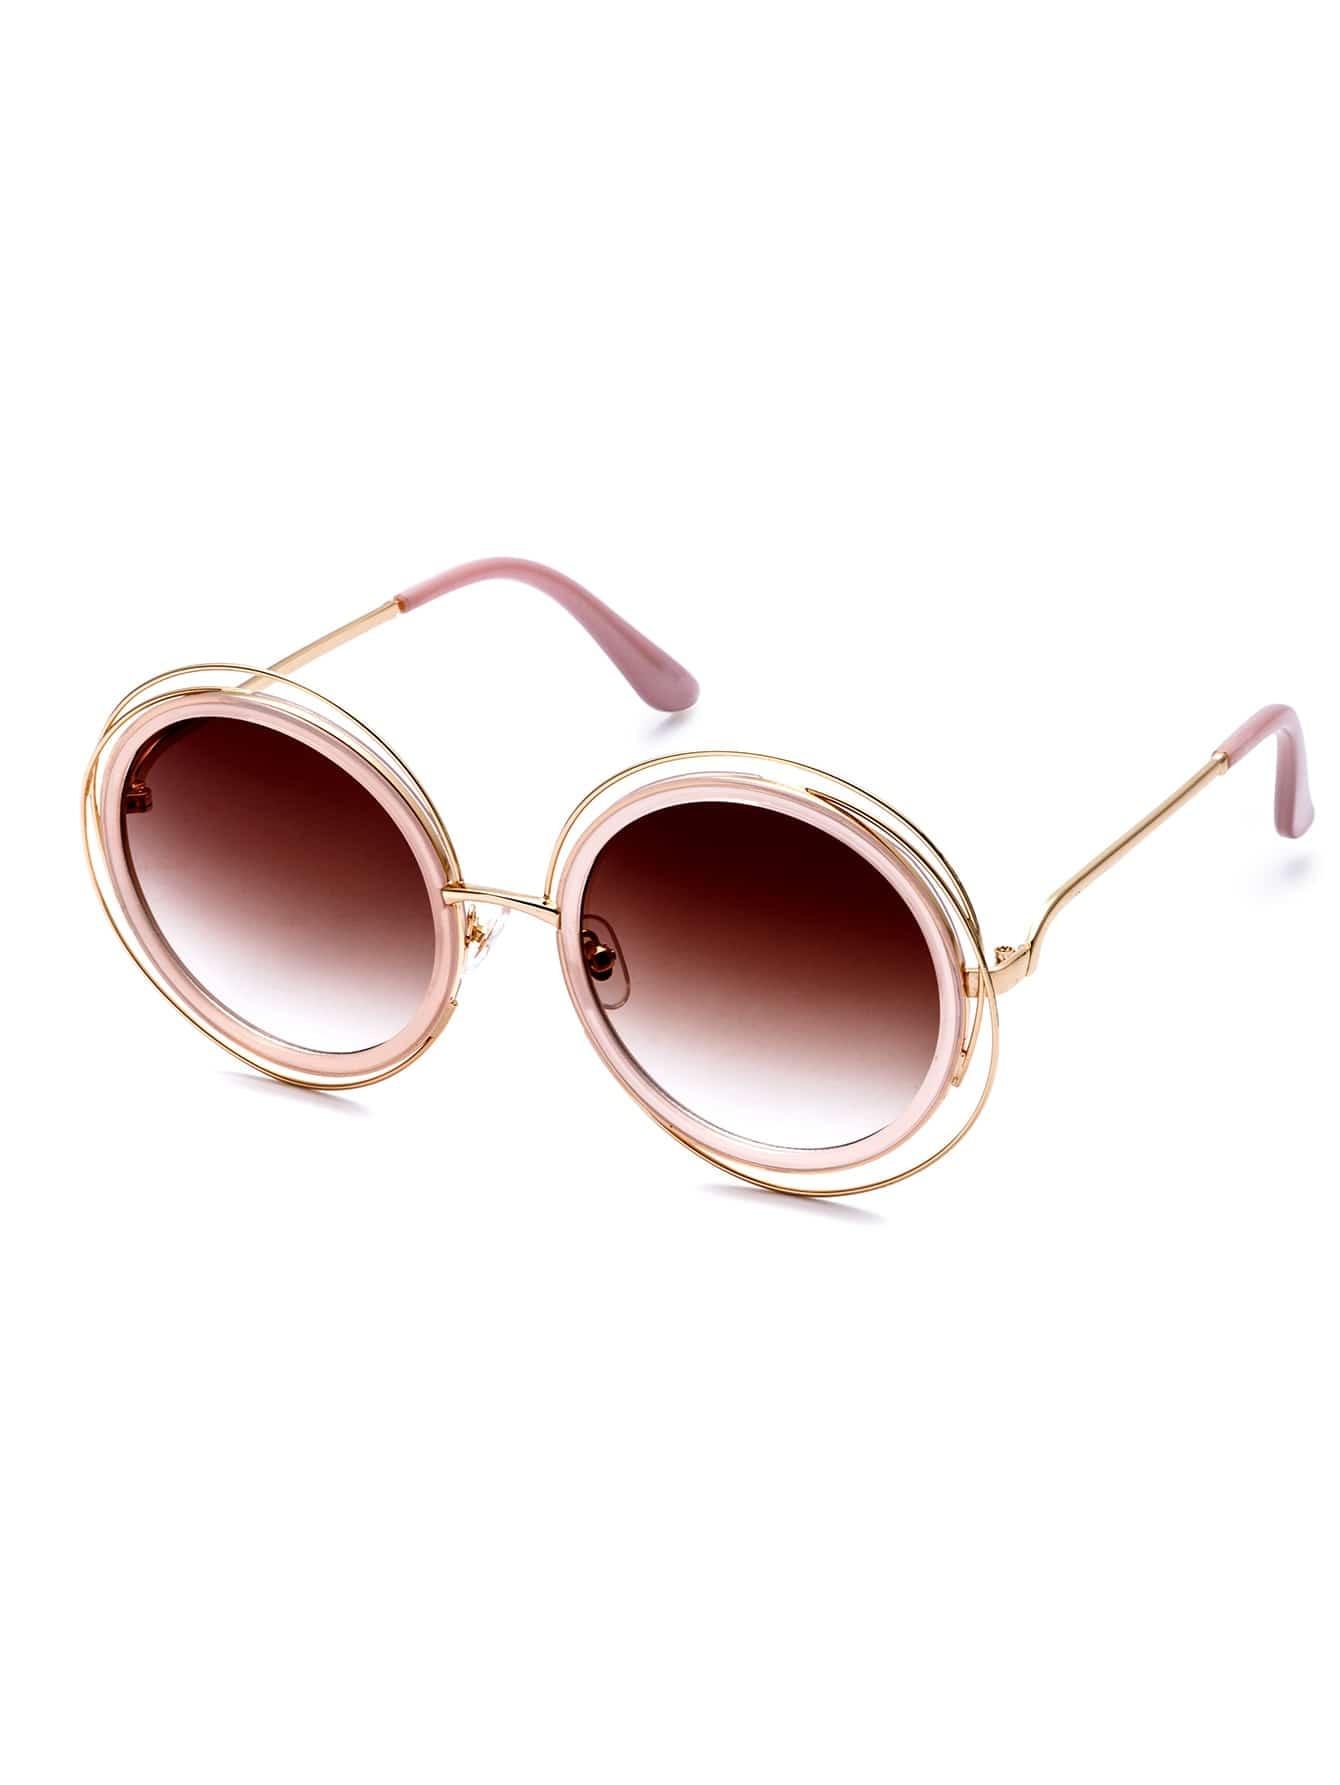 Pink Frame Round Lens Sunglasses